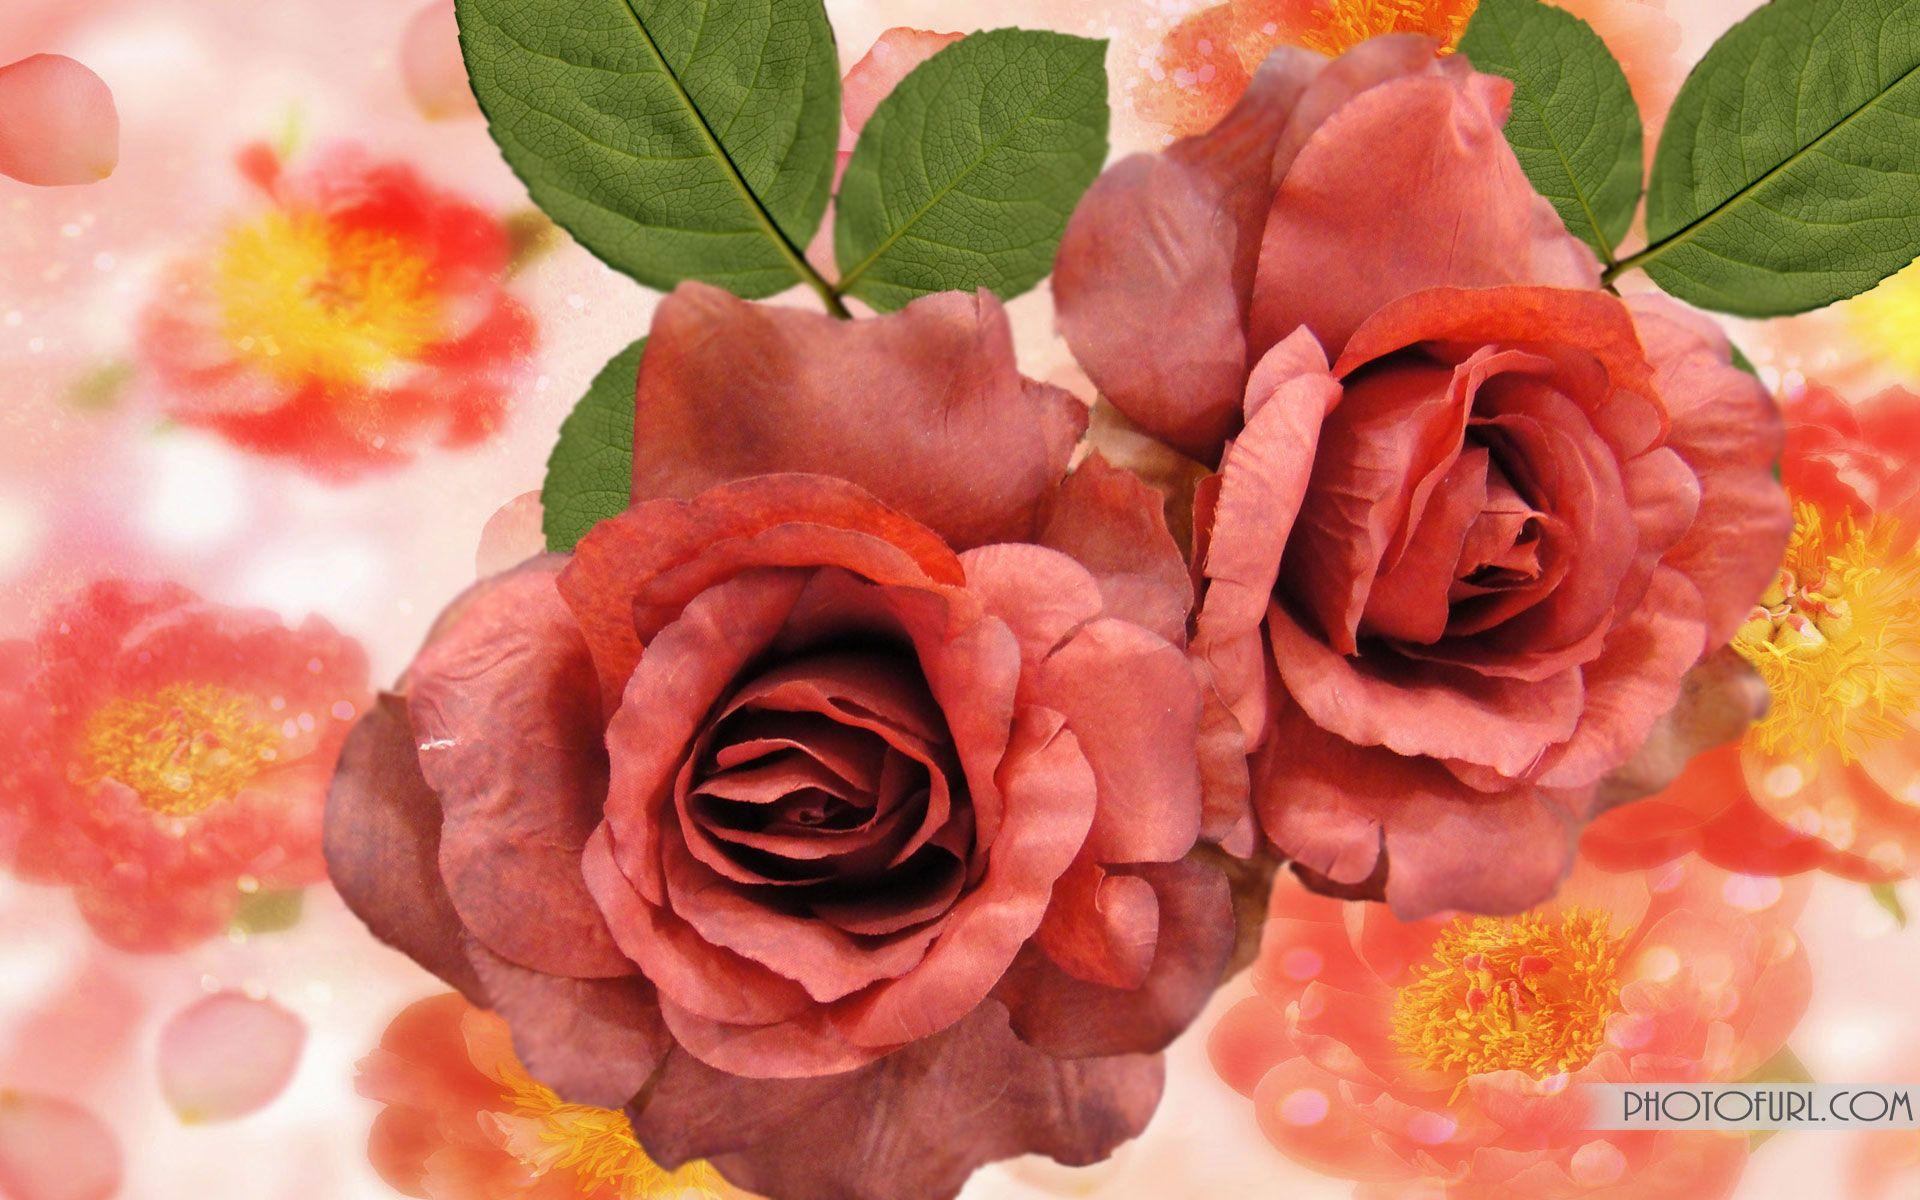 Beautiful red flower image hd wallpaper wallpaper wonderful life beautiful red flower image hd wallpaper wallpaper izmirmasajfo